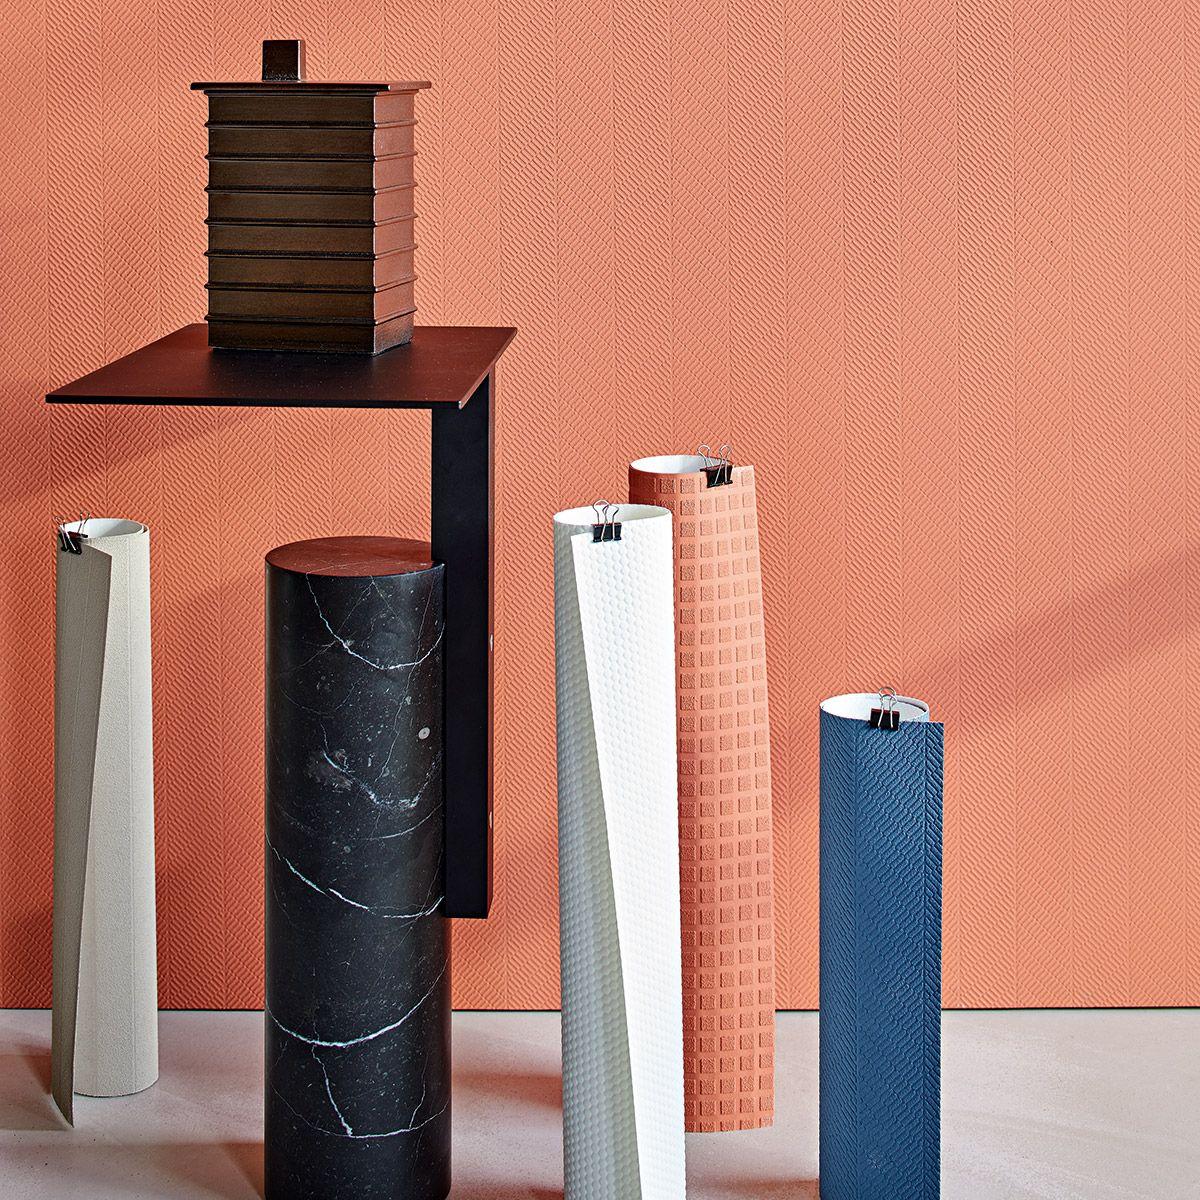 Tolle Tone Klassische Bauhaus Tapeten Neu Aufgelegt Bild 5 Electronic Products